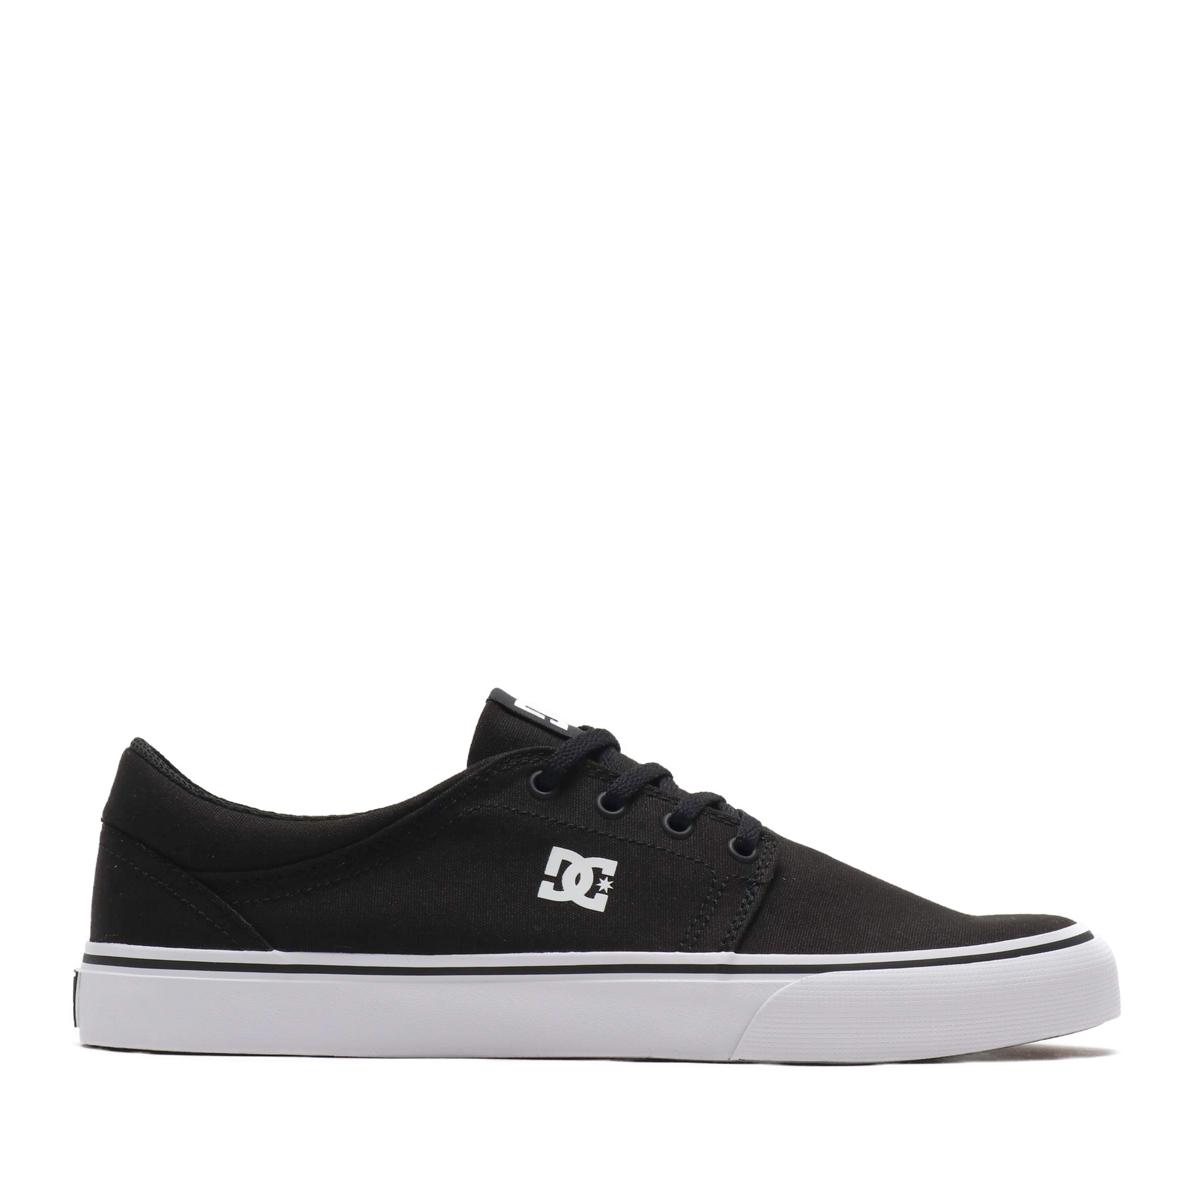 f4dfc759d76f ... kinetics dc shoes trase tx black white d sea shoes trace tx ...